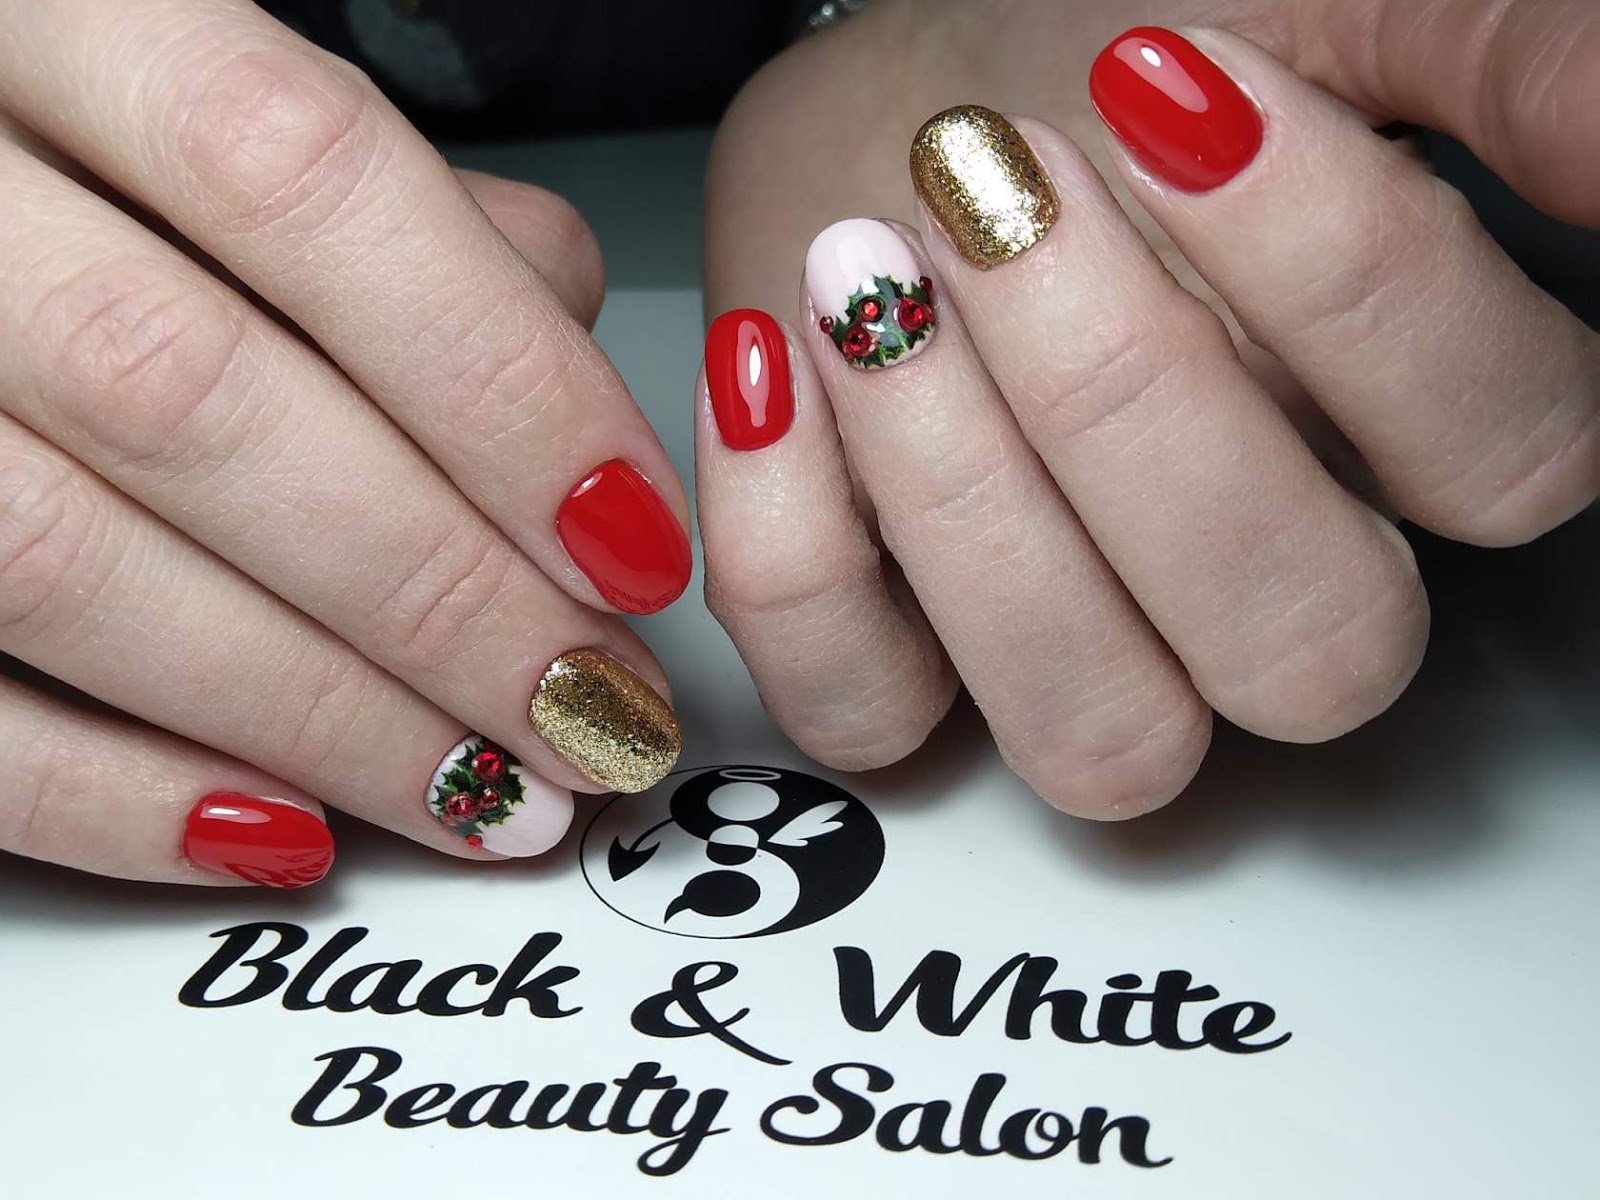 Black & White Nails Art Disign: Manhattan Nails In Bromsgrove